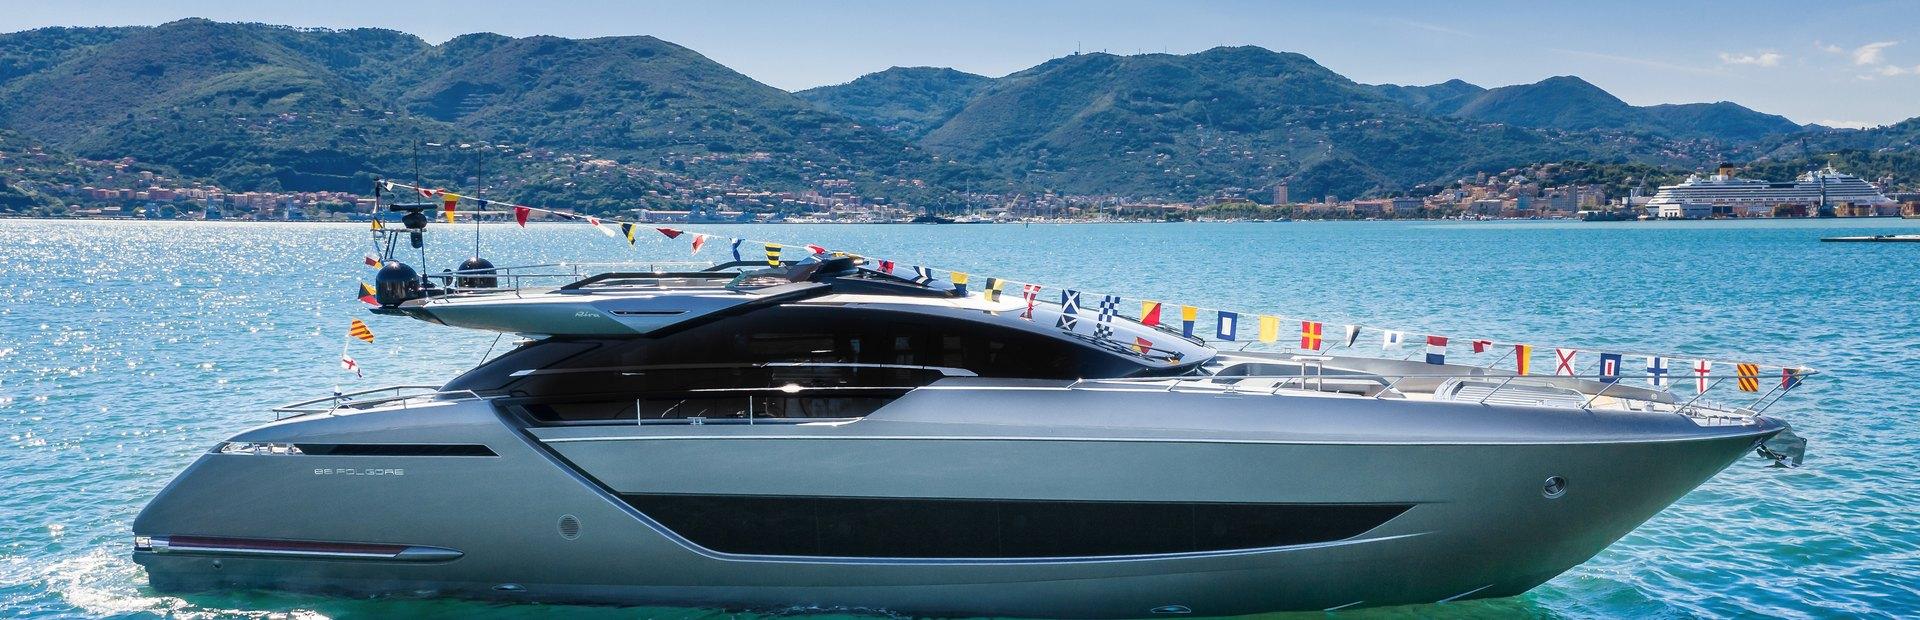 Riva 88' Folgore Yacht Charter